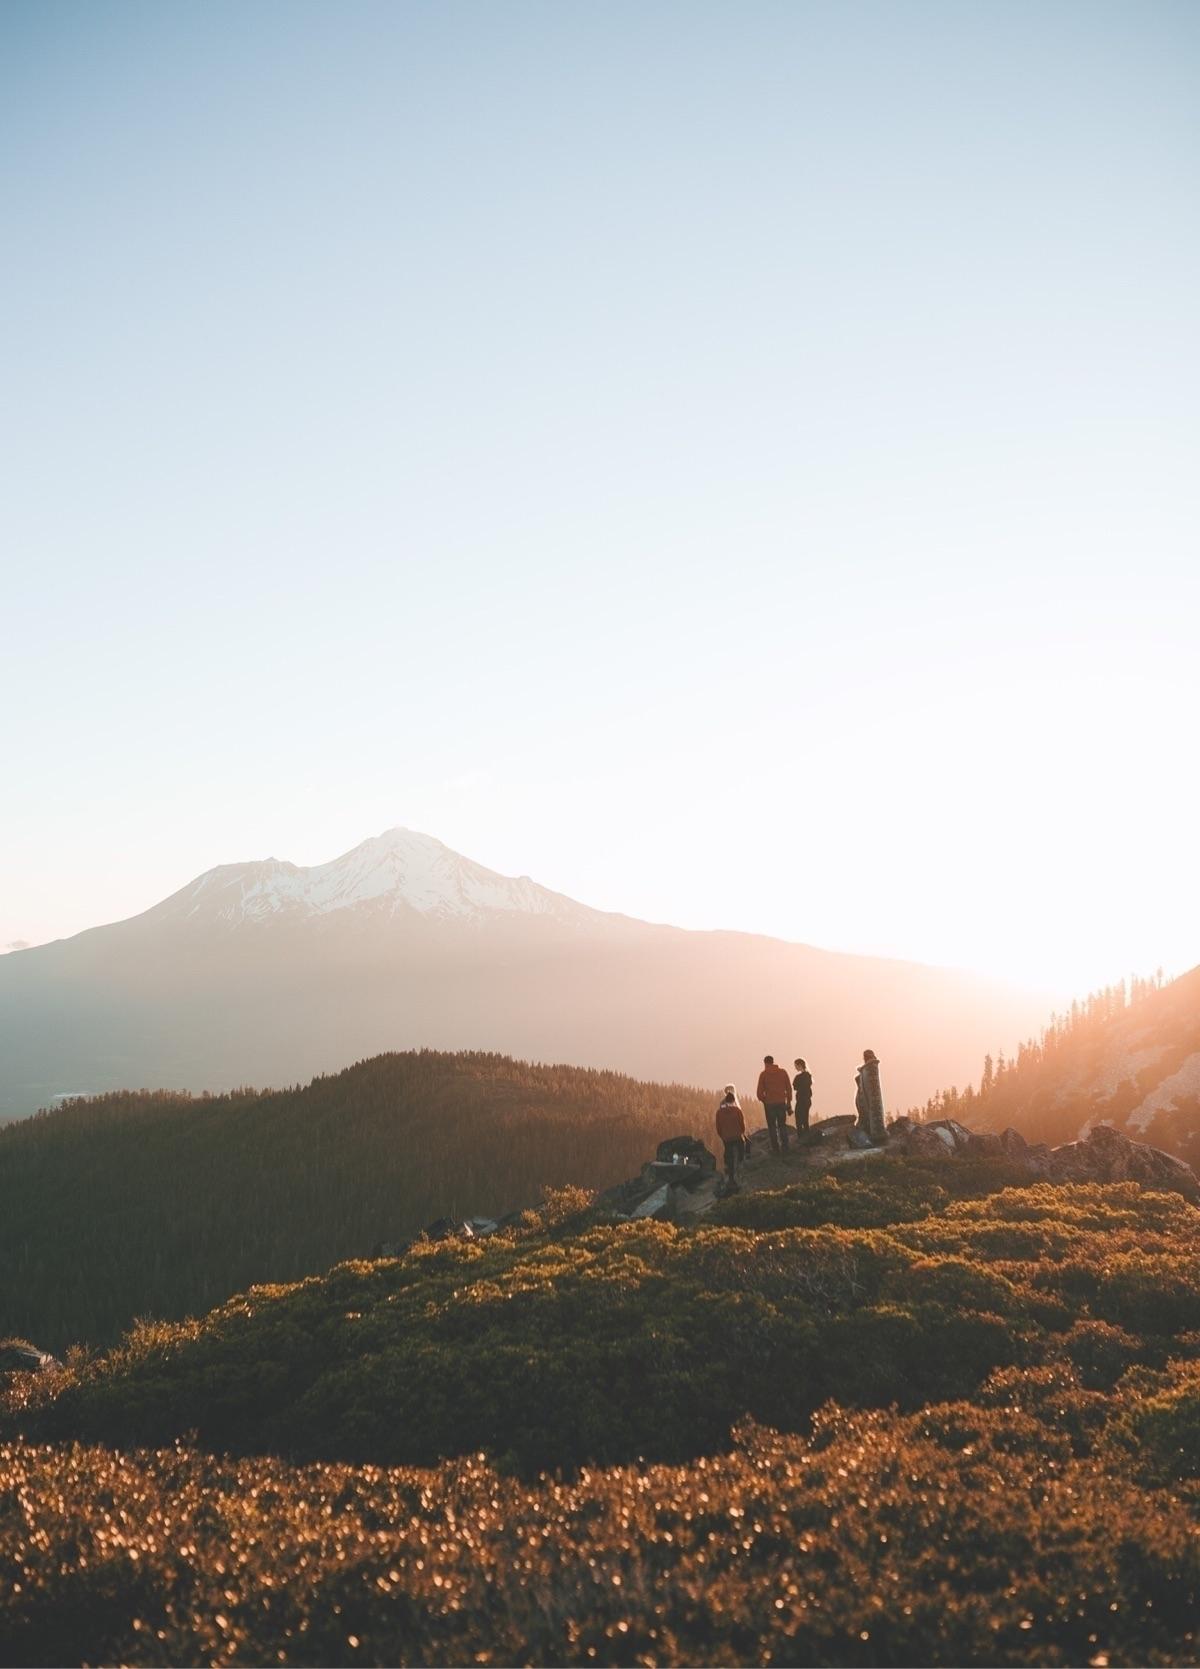 Instagram - canon, hiking, adventure - davishev | ello